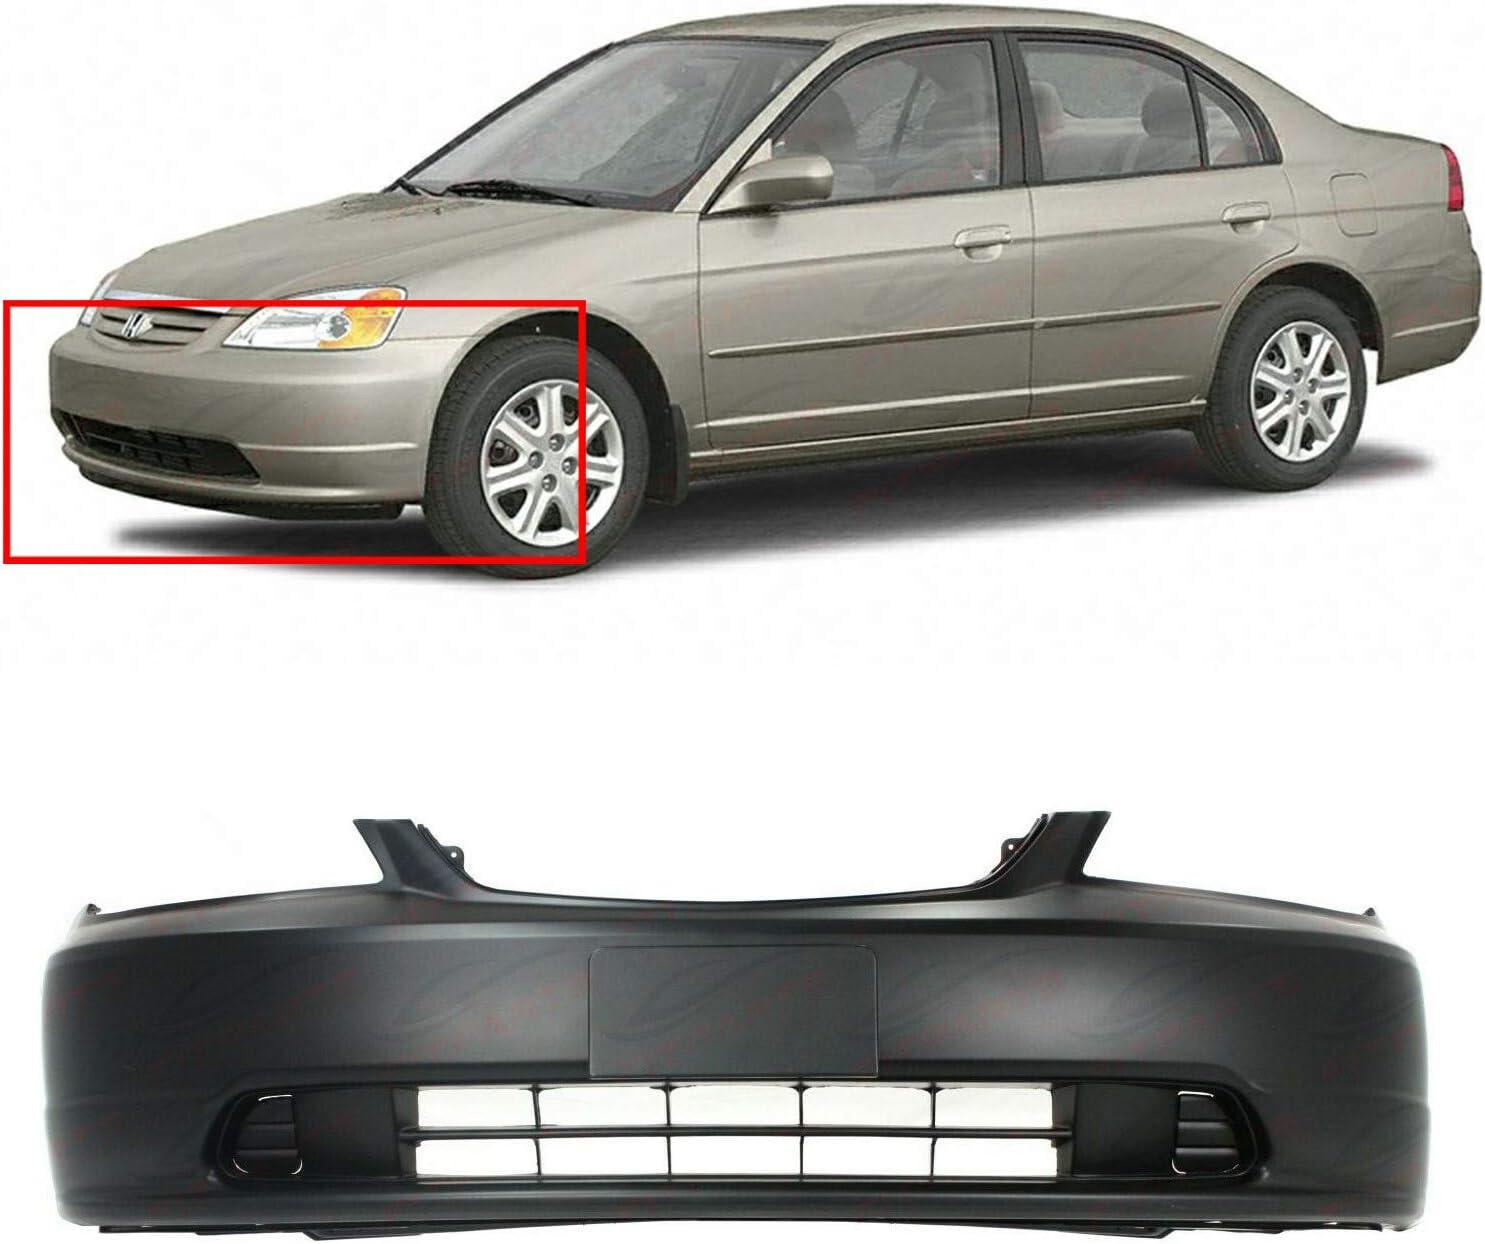 Primed Front Bumper Cover Fascia for 2001-2003 Honda Civic Coupe Sedan HO1000197